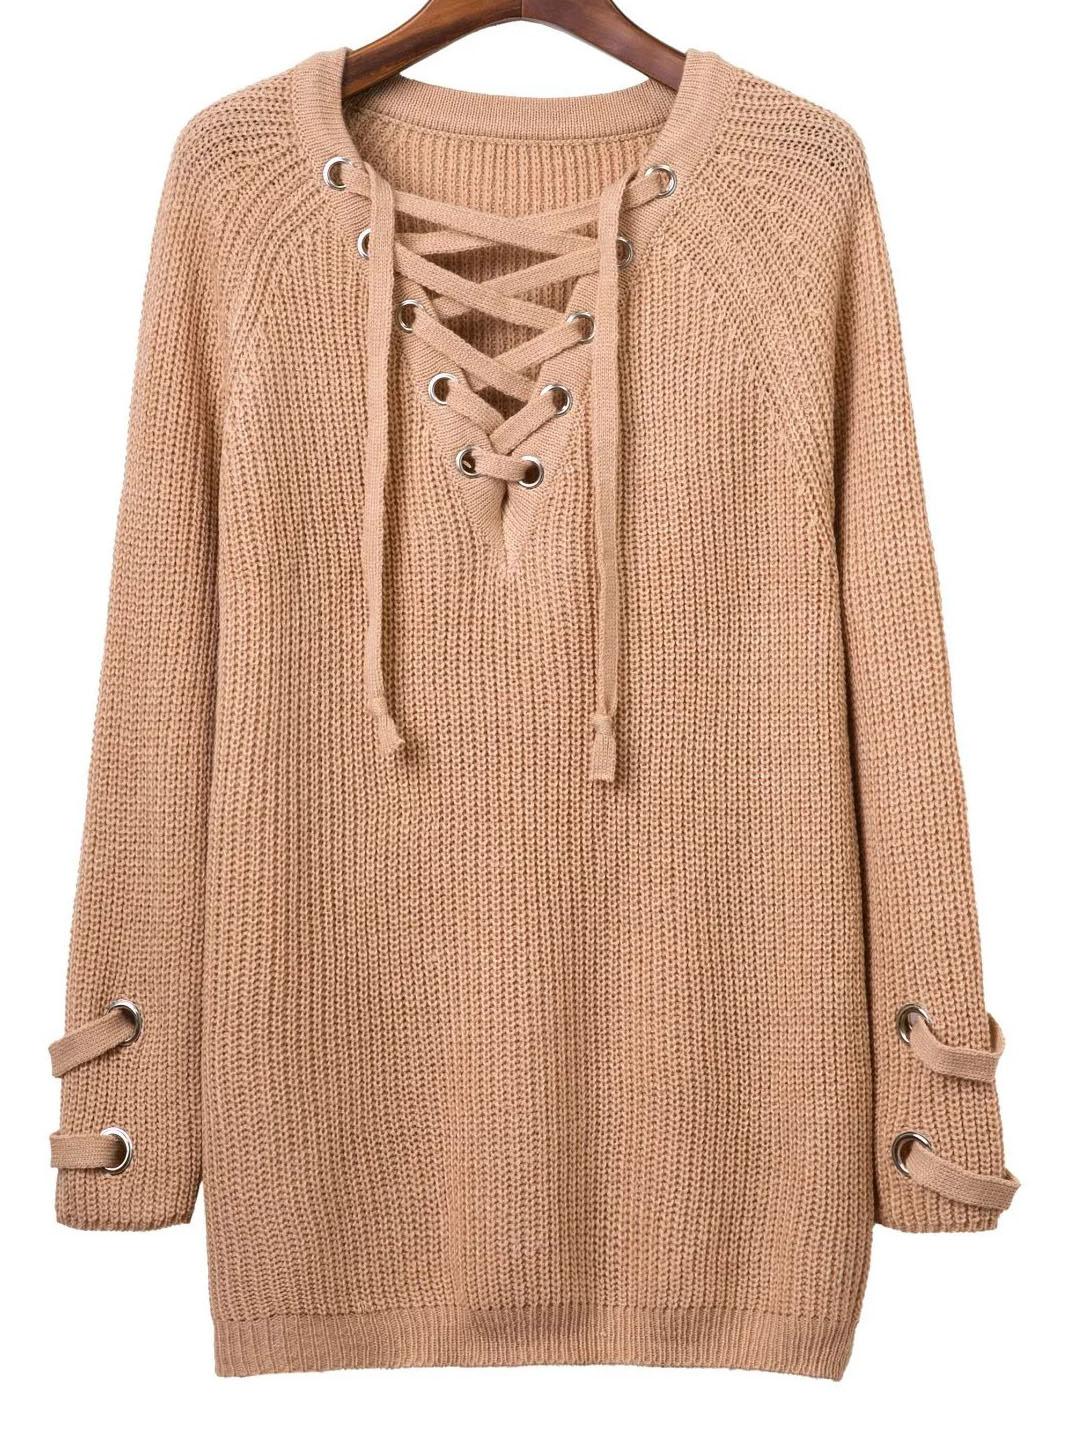 Khaki Eyelet Lace Up V Neck Knit Dress -SheIn(Sheinside) 0b064ad36